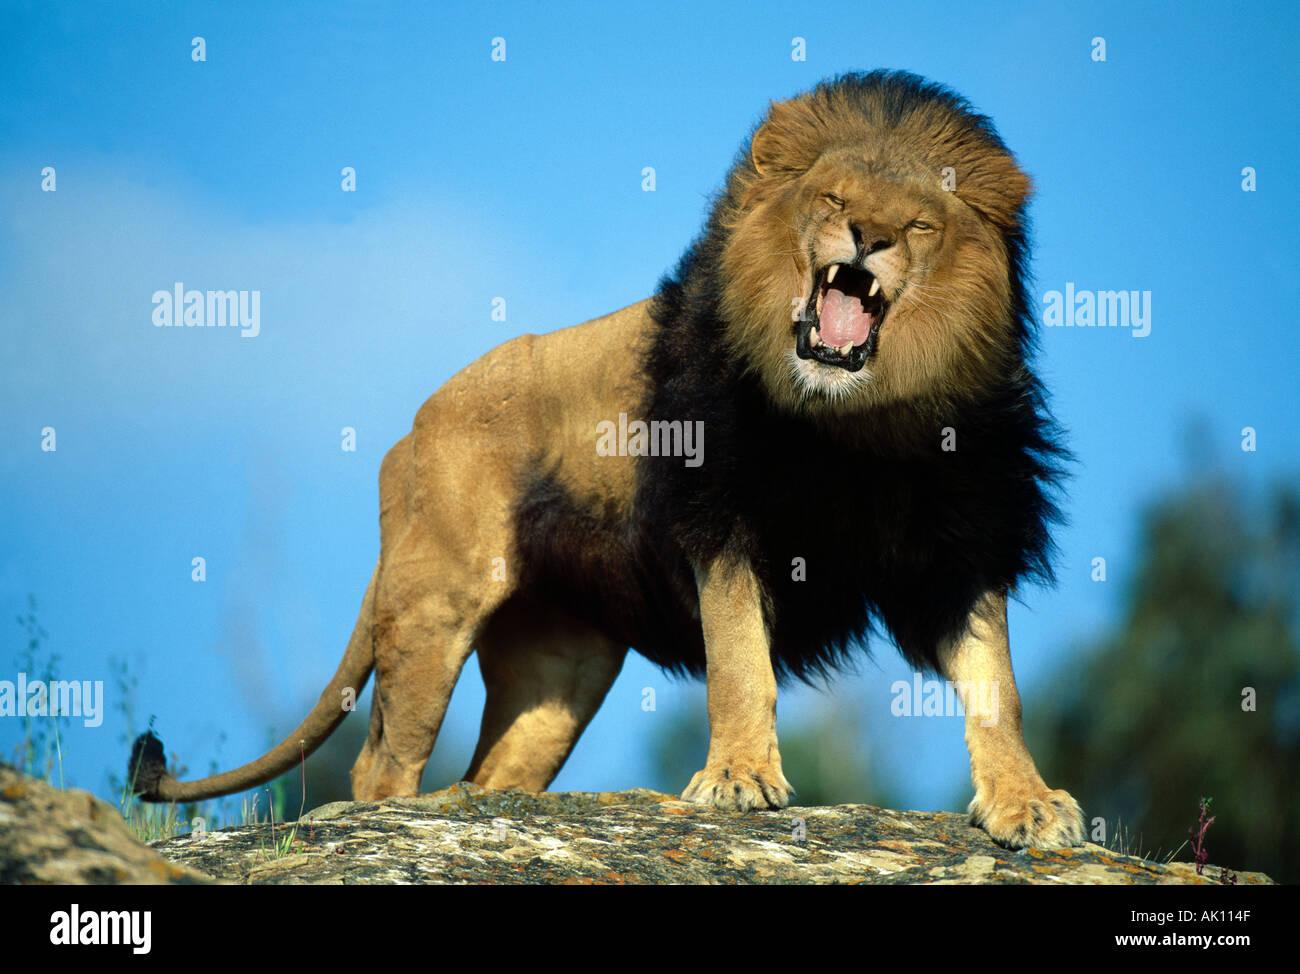 African Lion Roaring Animal Model Stock Photo: 1249614 - Alamy - photo#29